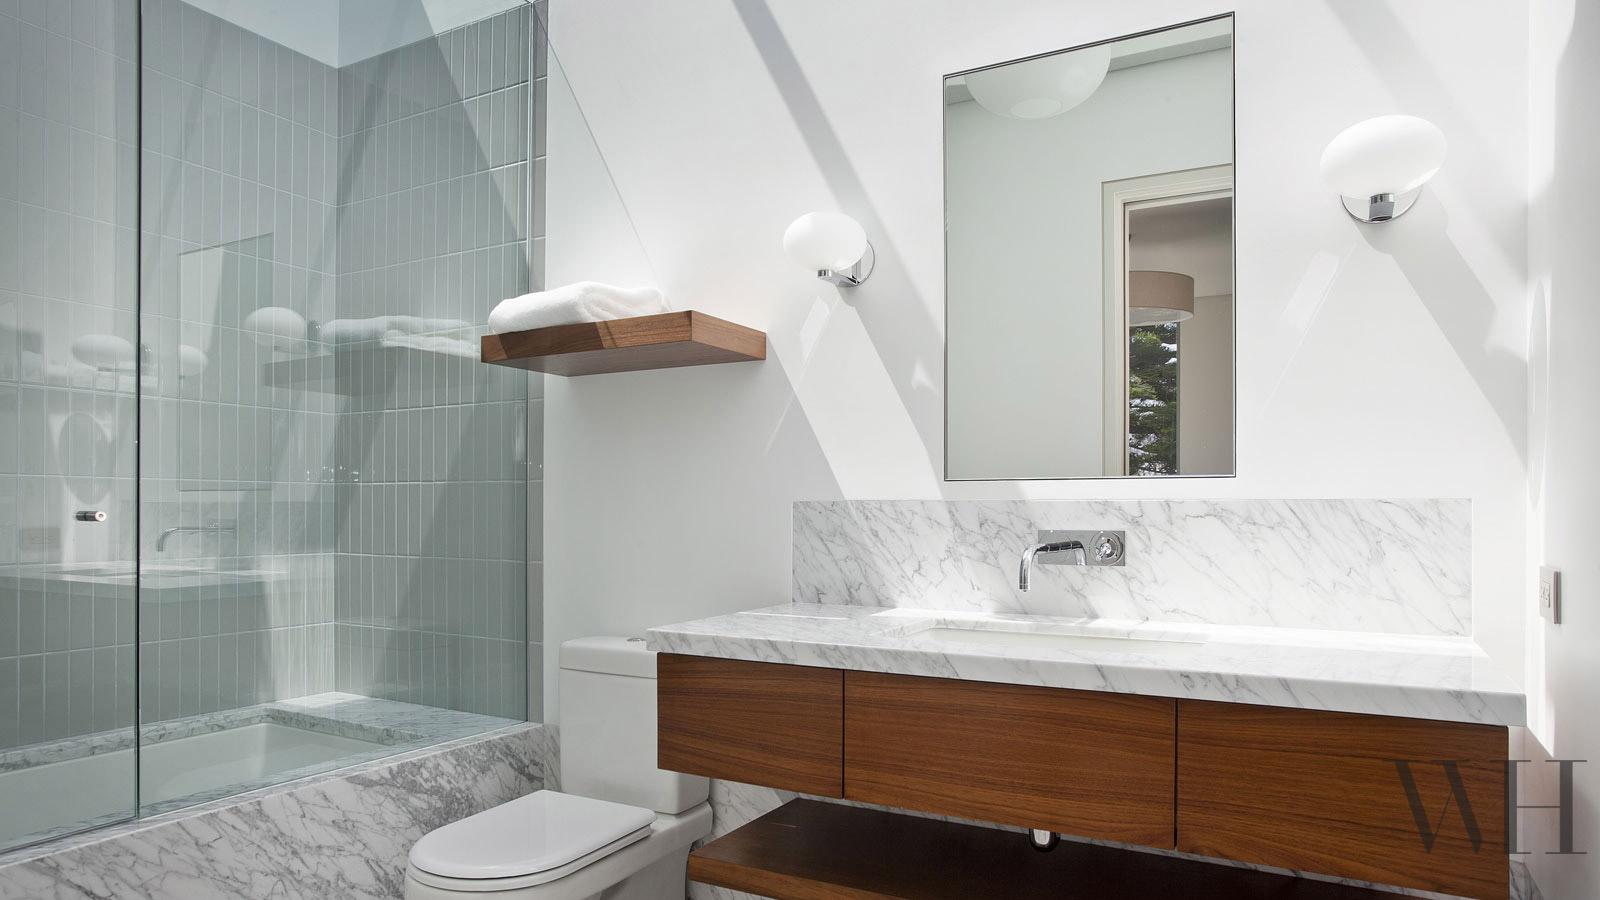 Mosaic Tile Shower: Chautauqua Residence House Architecture Design